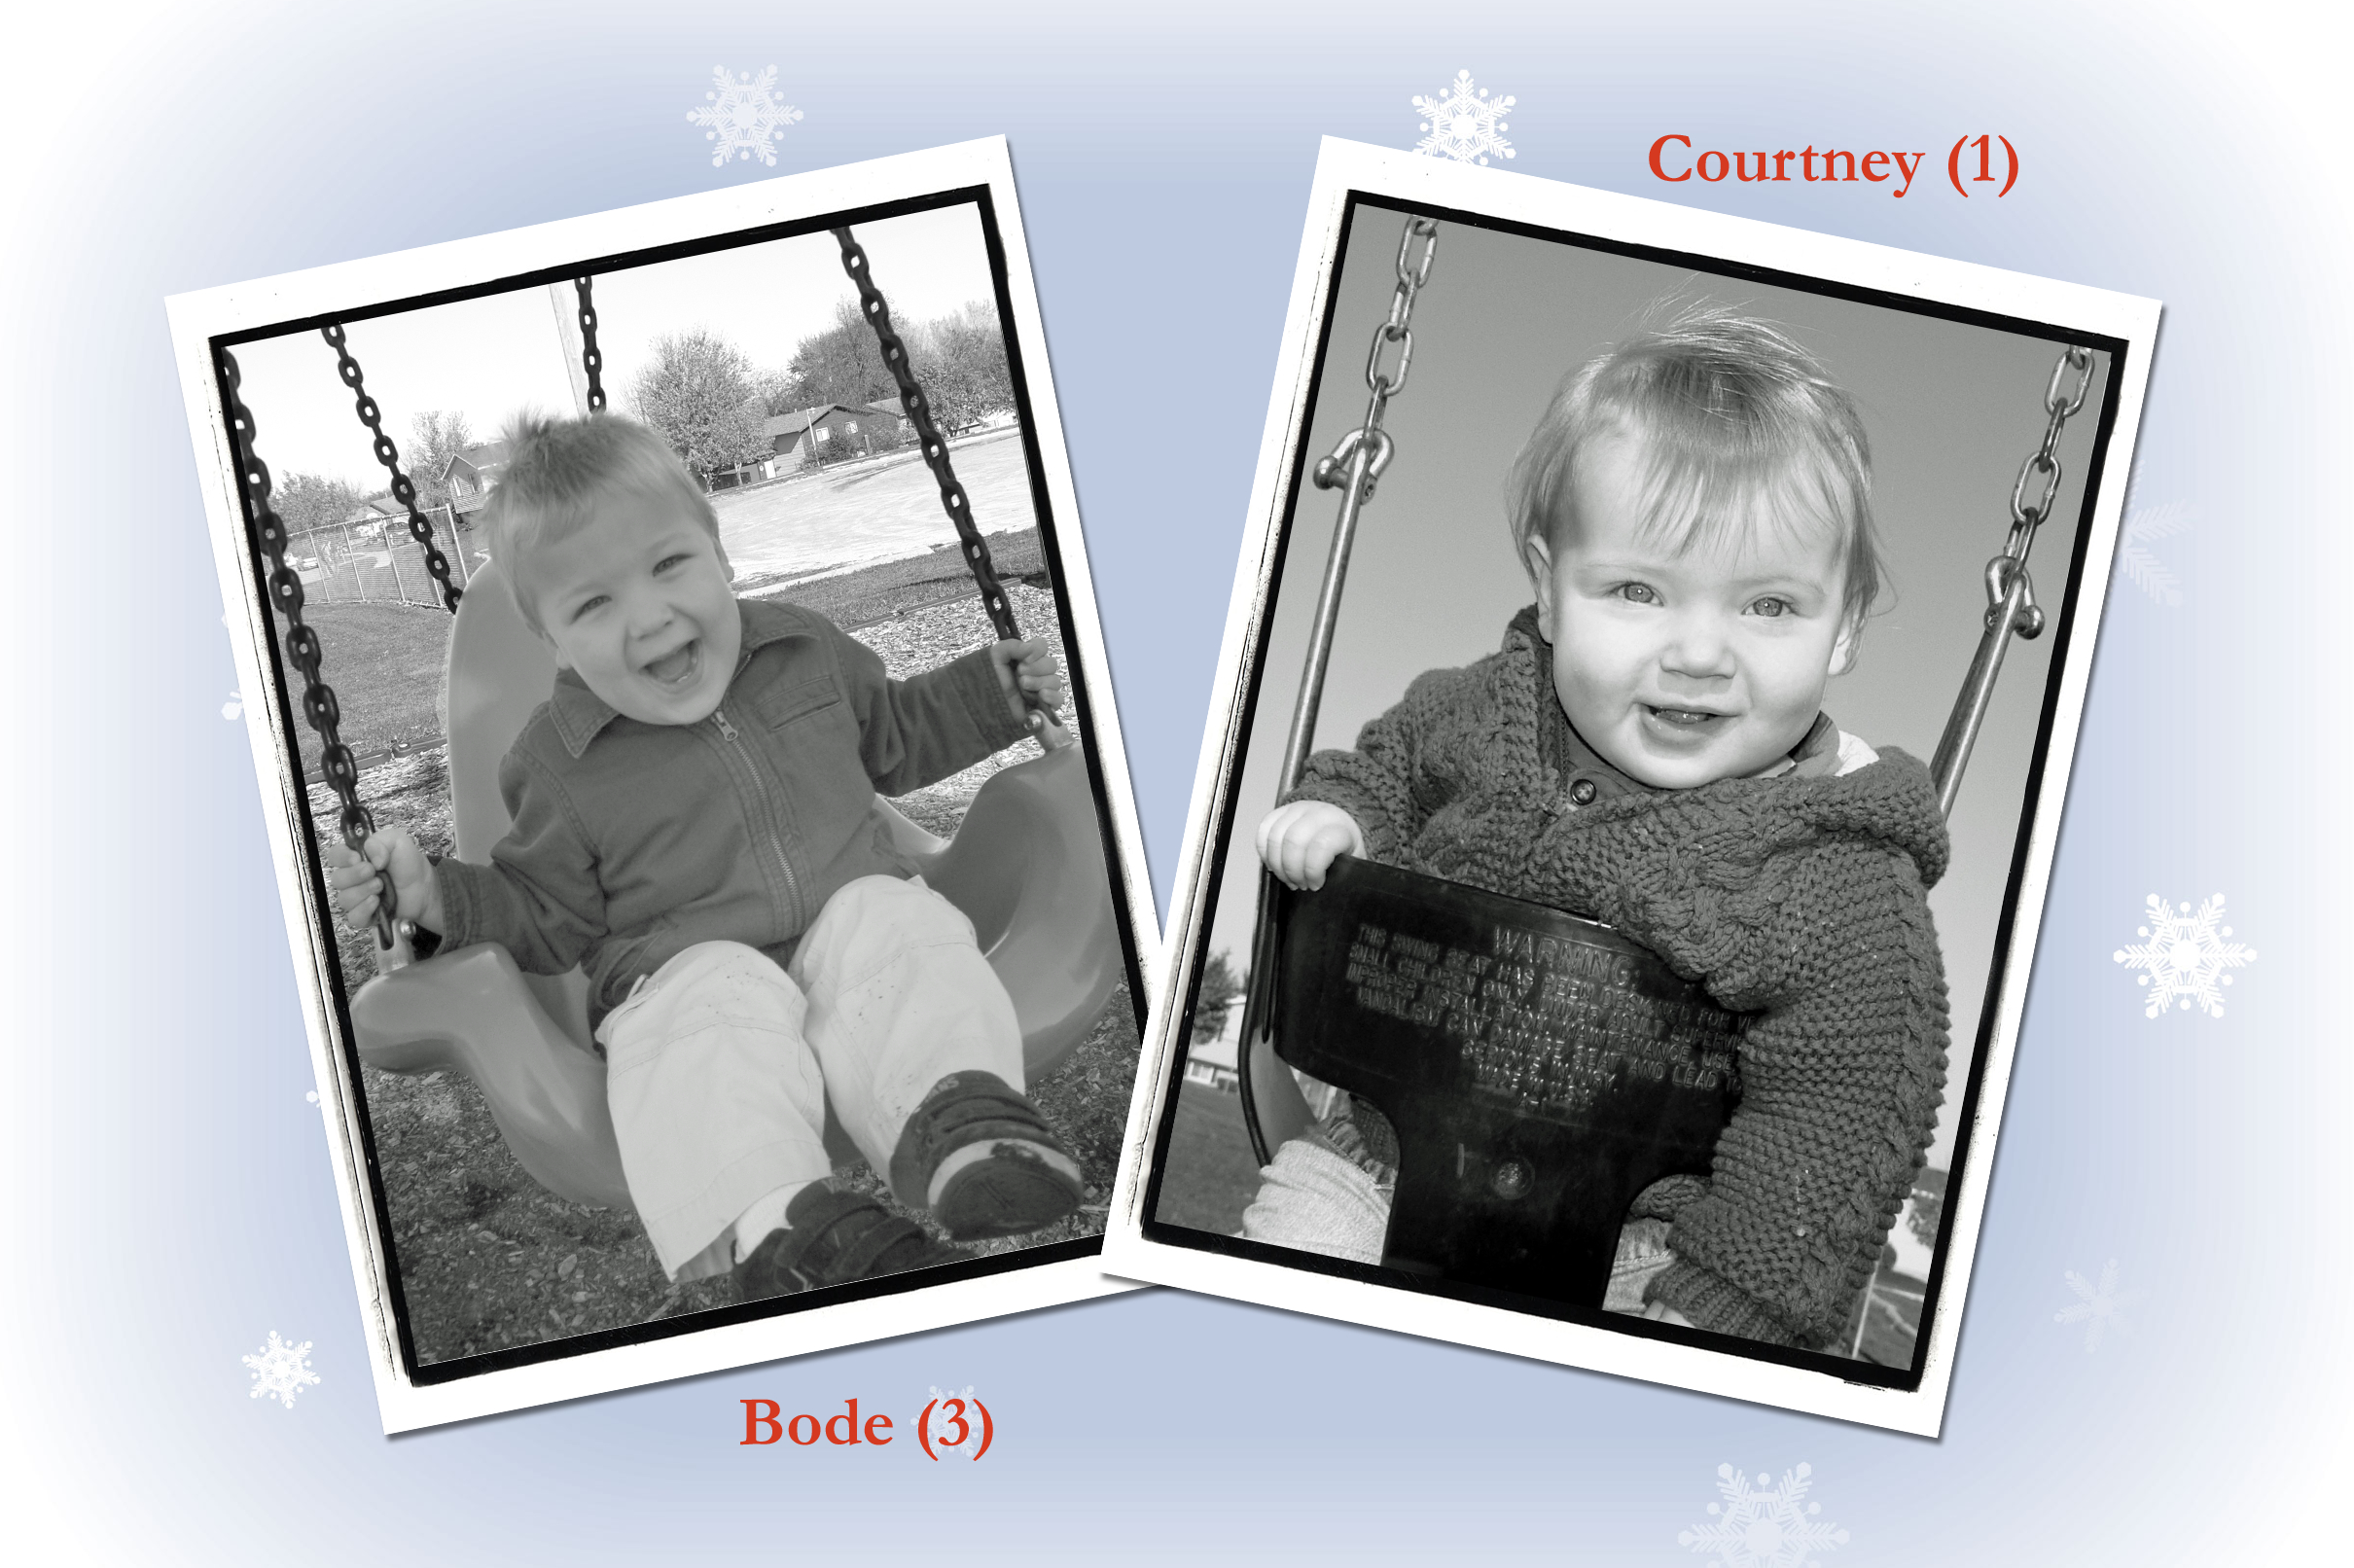 bode & courtney